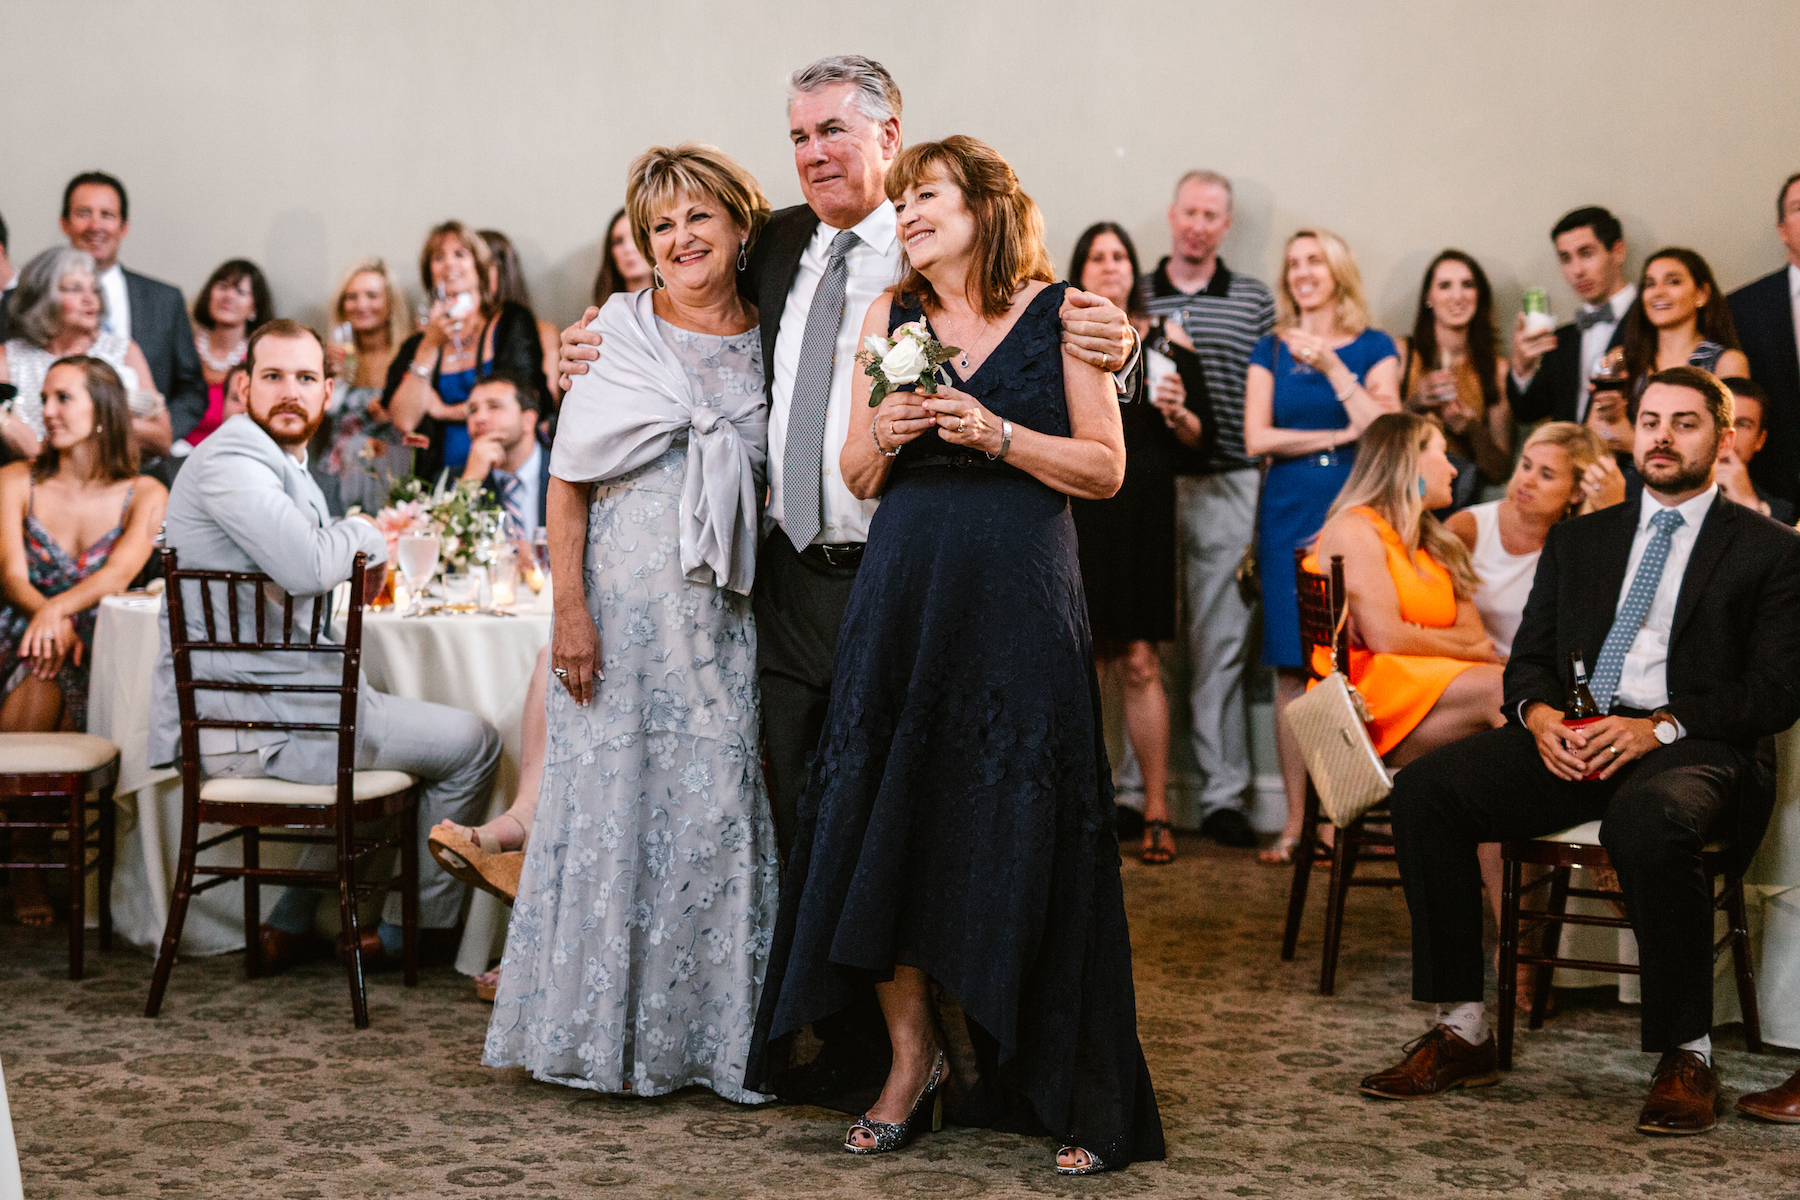 wedding-engagement-photographer-spartanburg-greenville-columbia-carolina-south-north-516.JPG